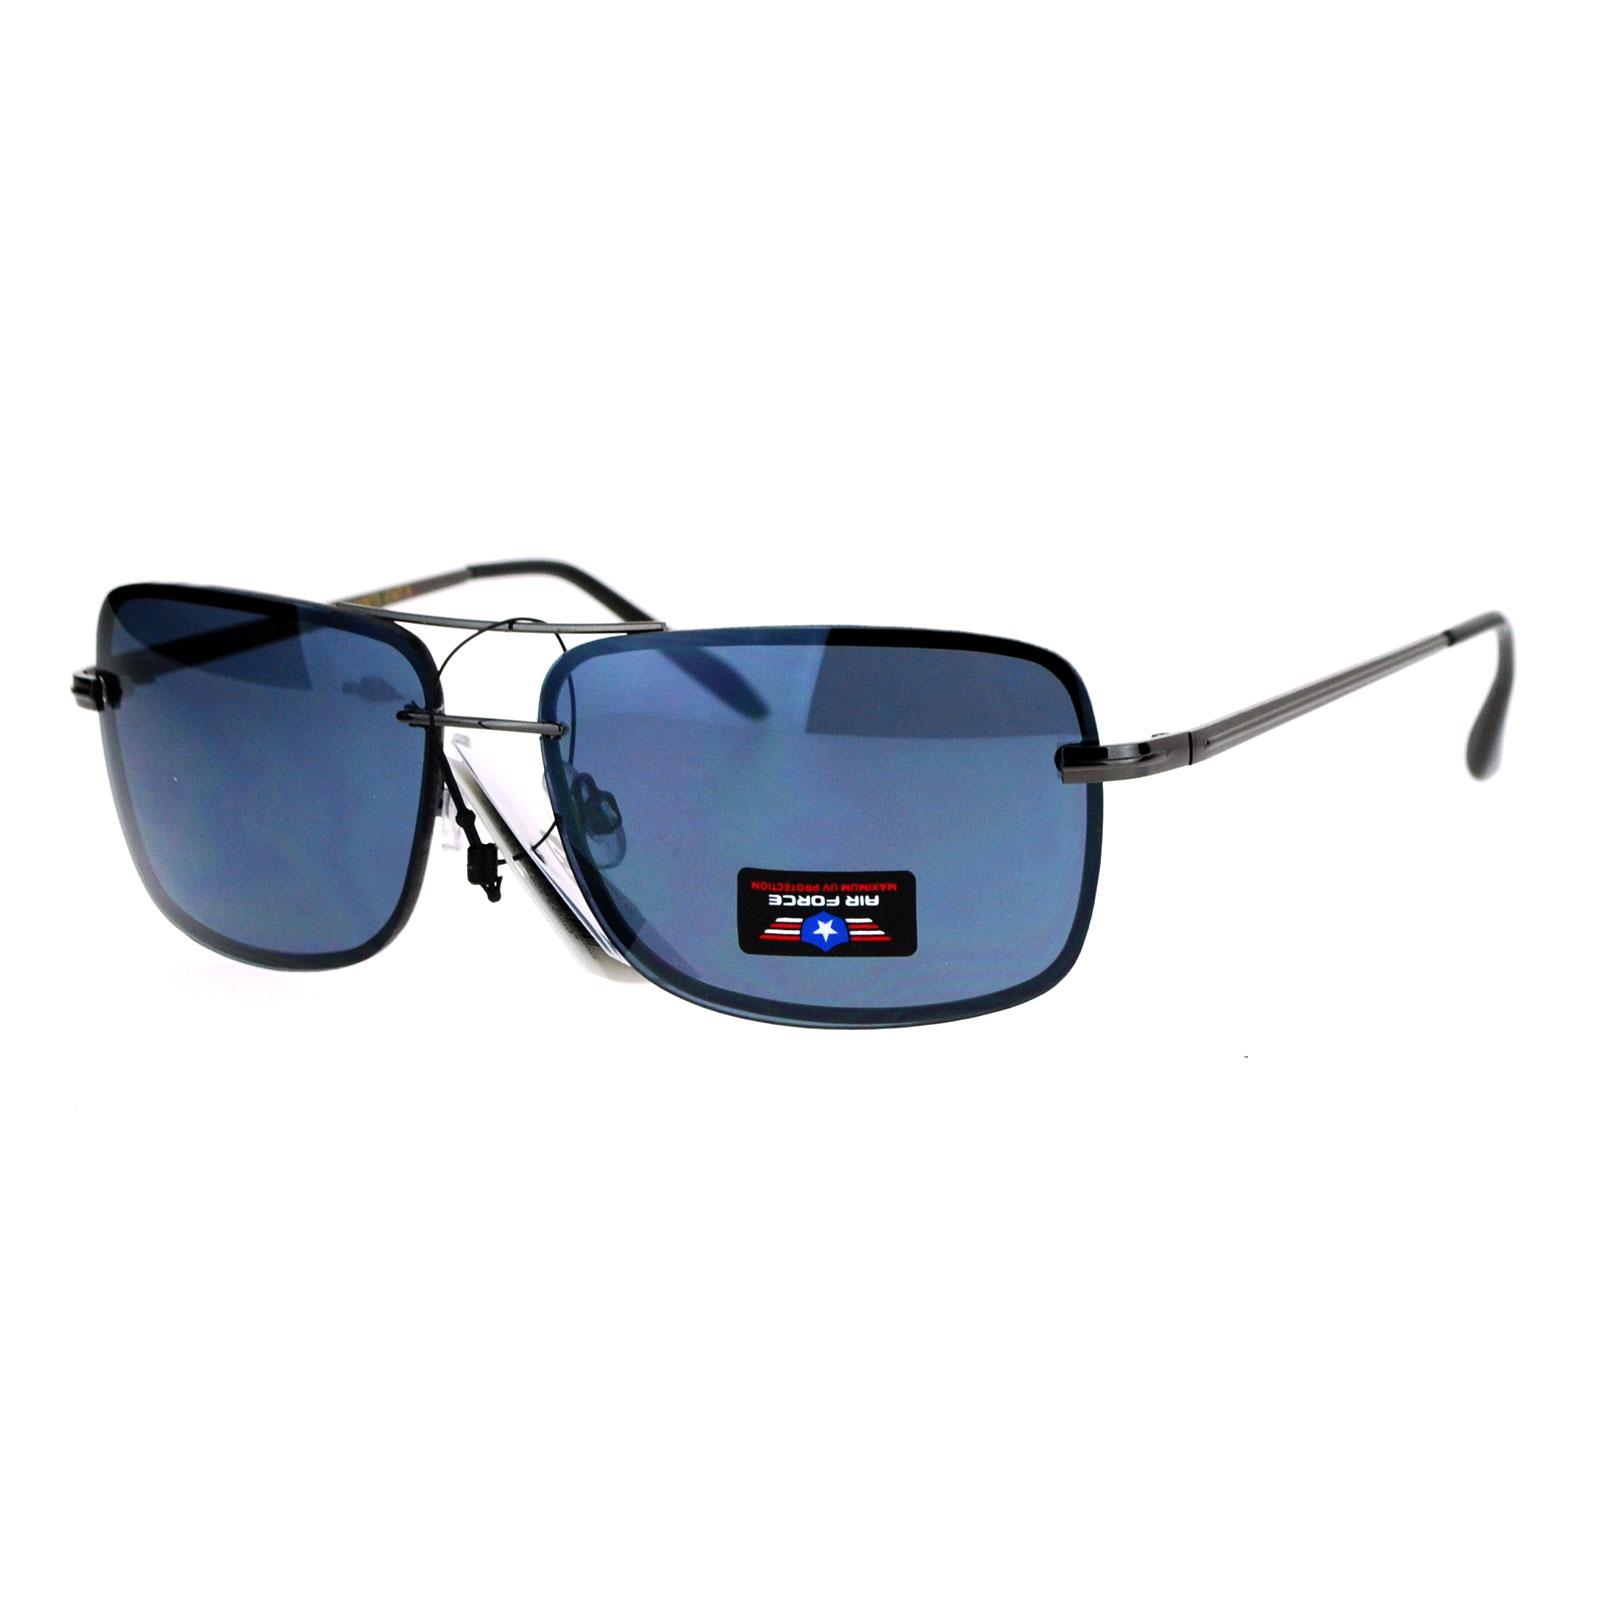 Rimless Aviator Sunglasses : SA106 Air Force Rimless Rectangular Aviator Sunglasses eBay